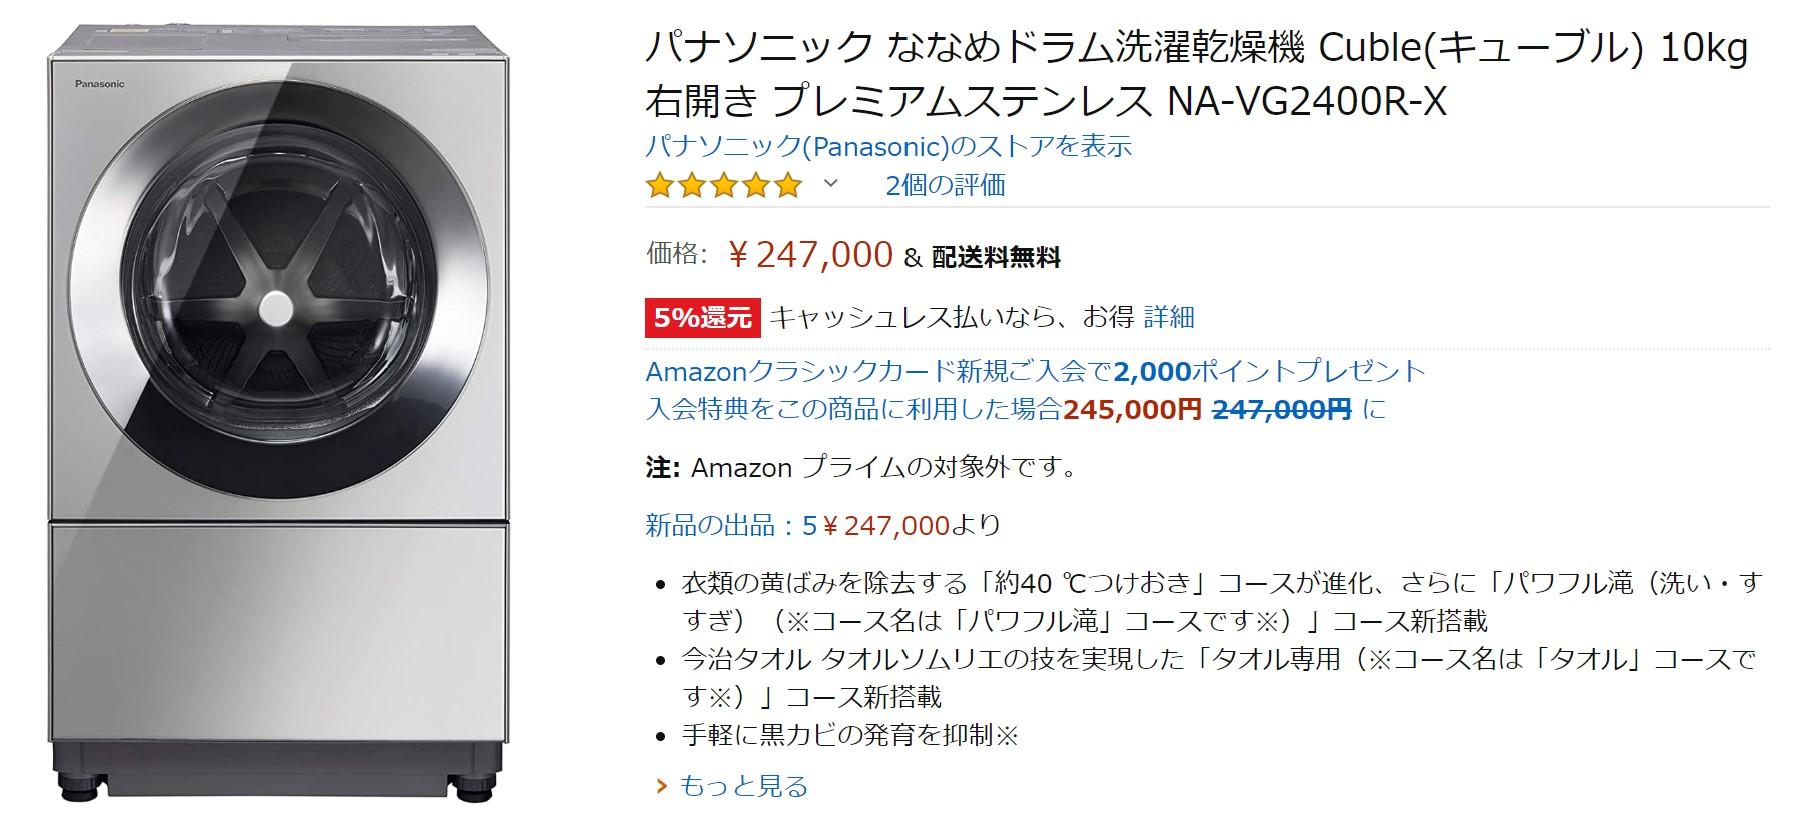 Panasonic NA-VG2400R-Xの価格相場